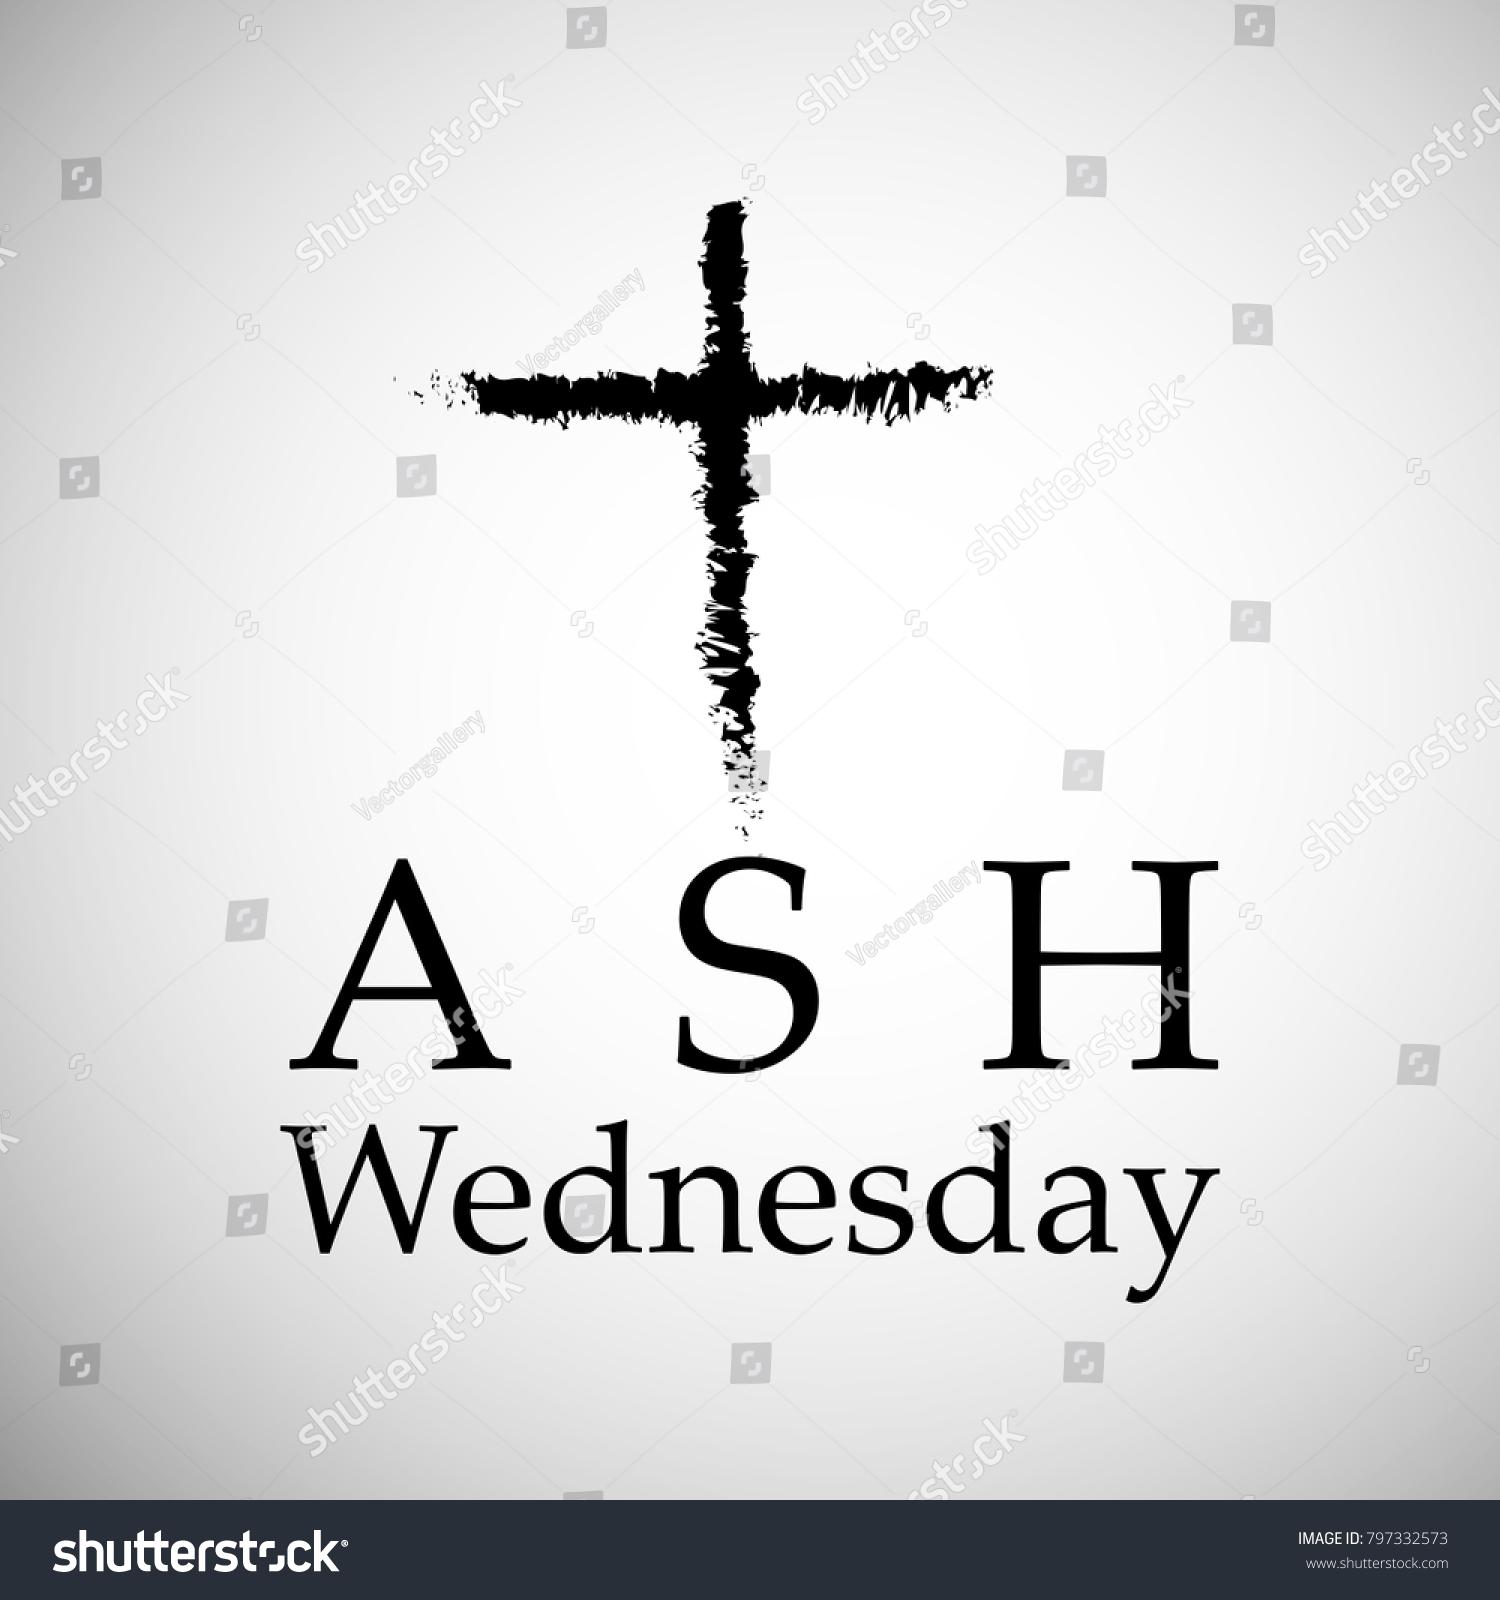 Illustration ashes cross ash wednesday stock vector 797332573 illustration of ashes cross for ash wednesday buycottarizona Image collections